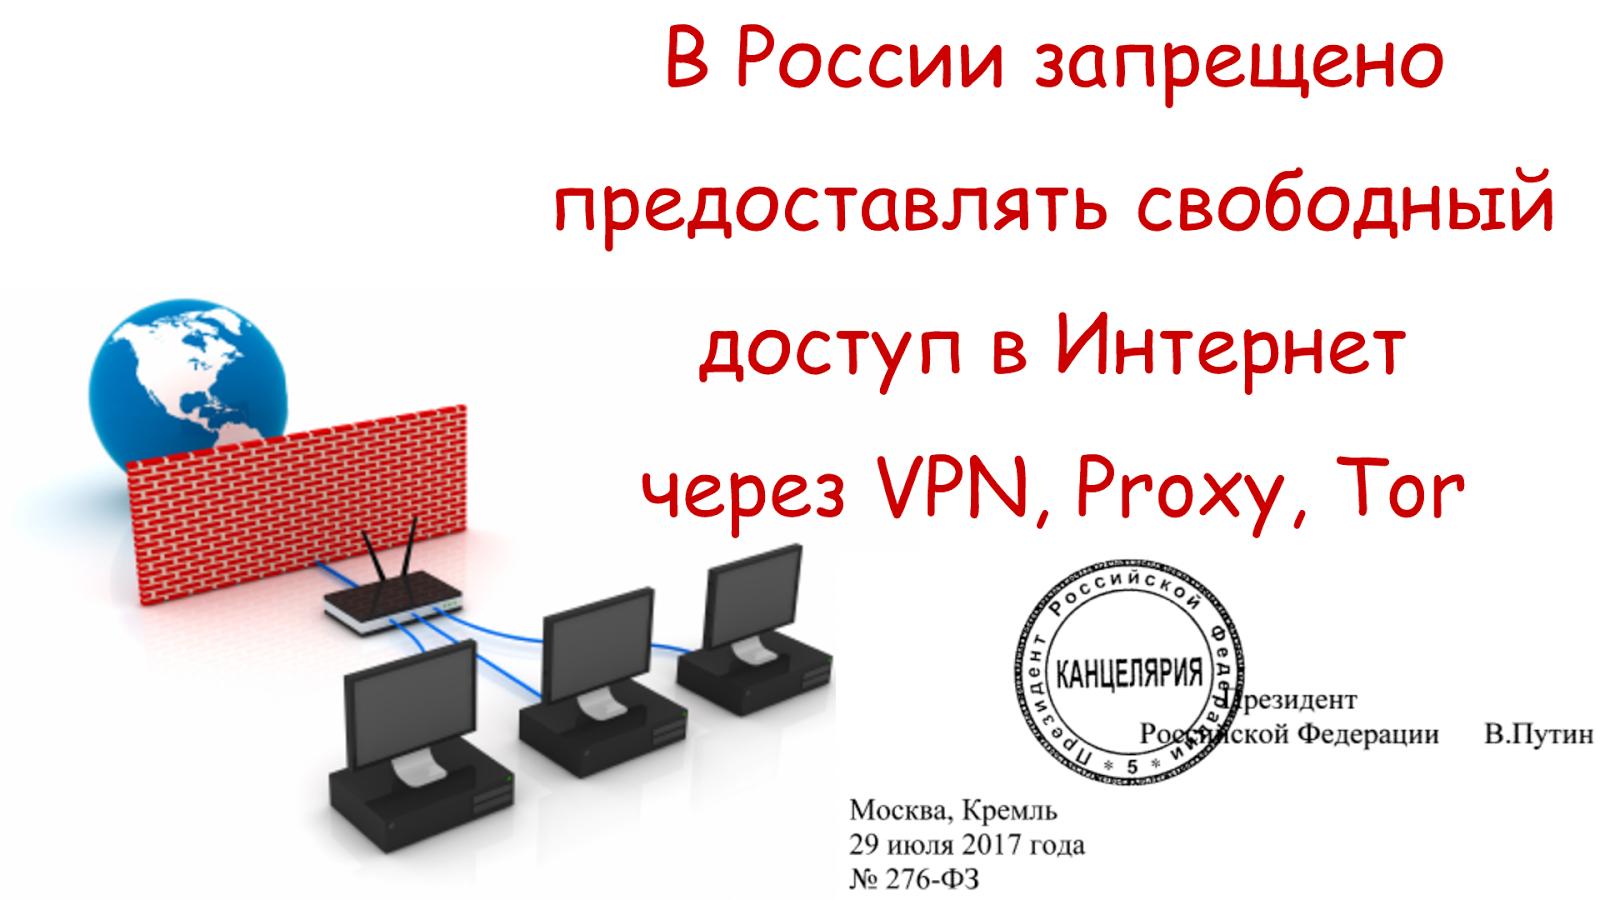 How to setup vpn with meraki